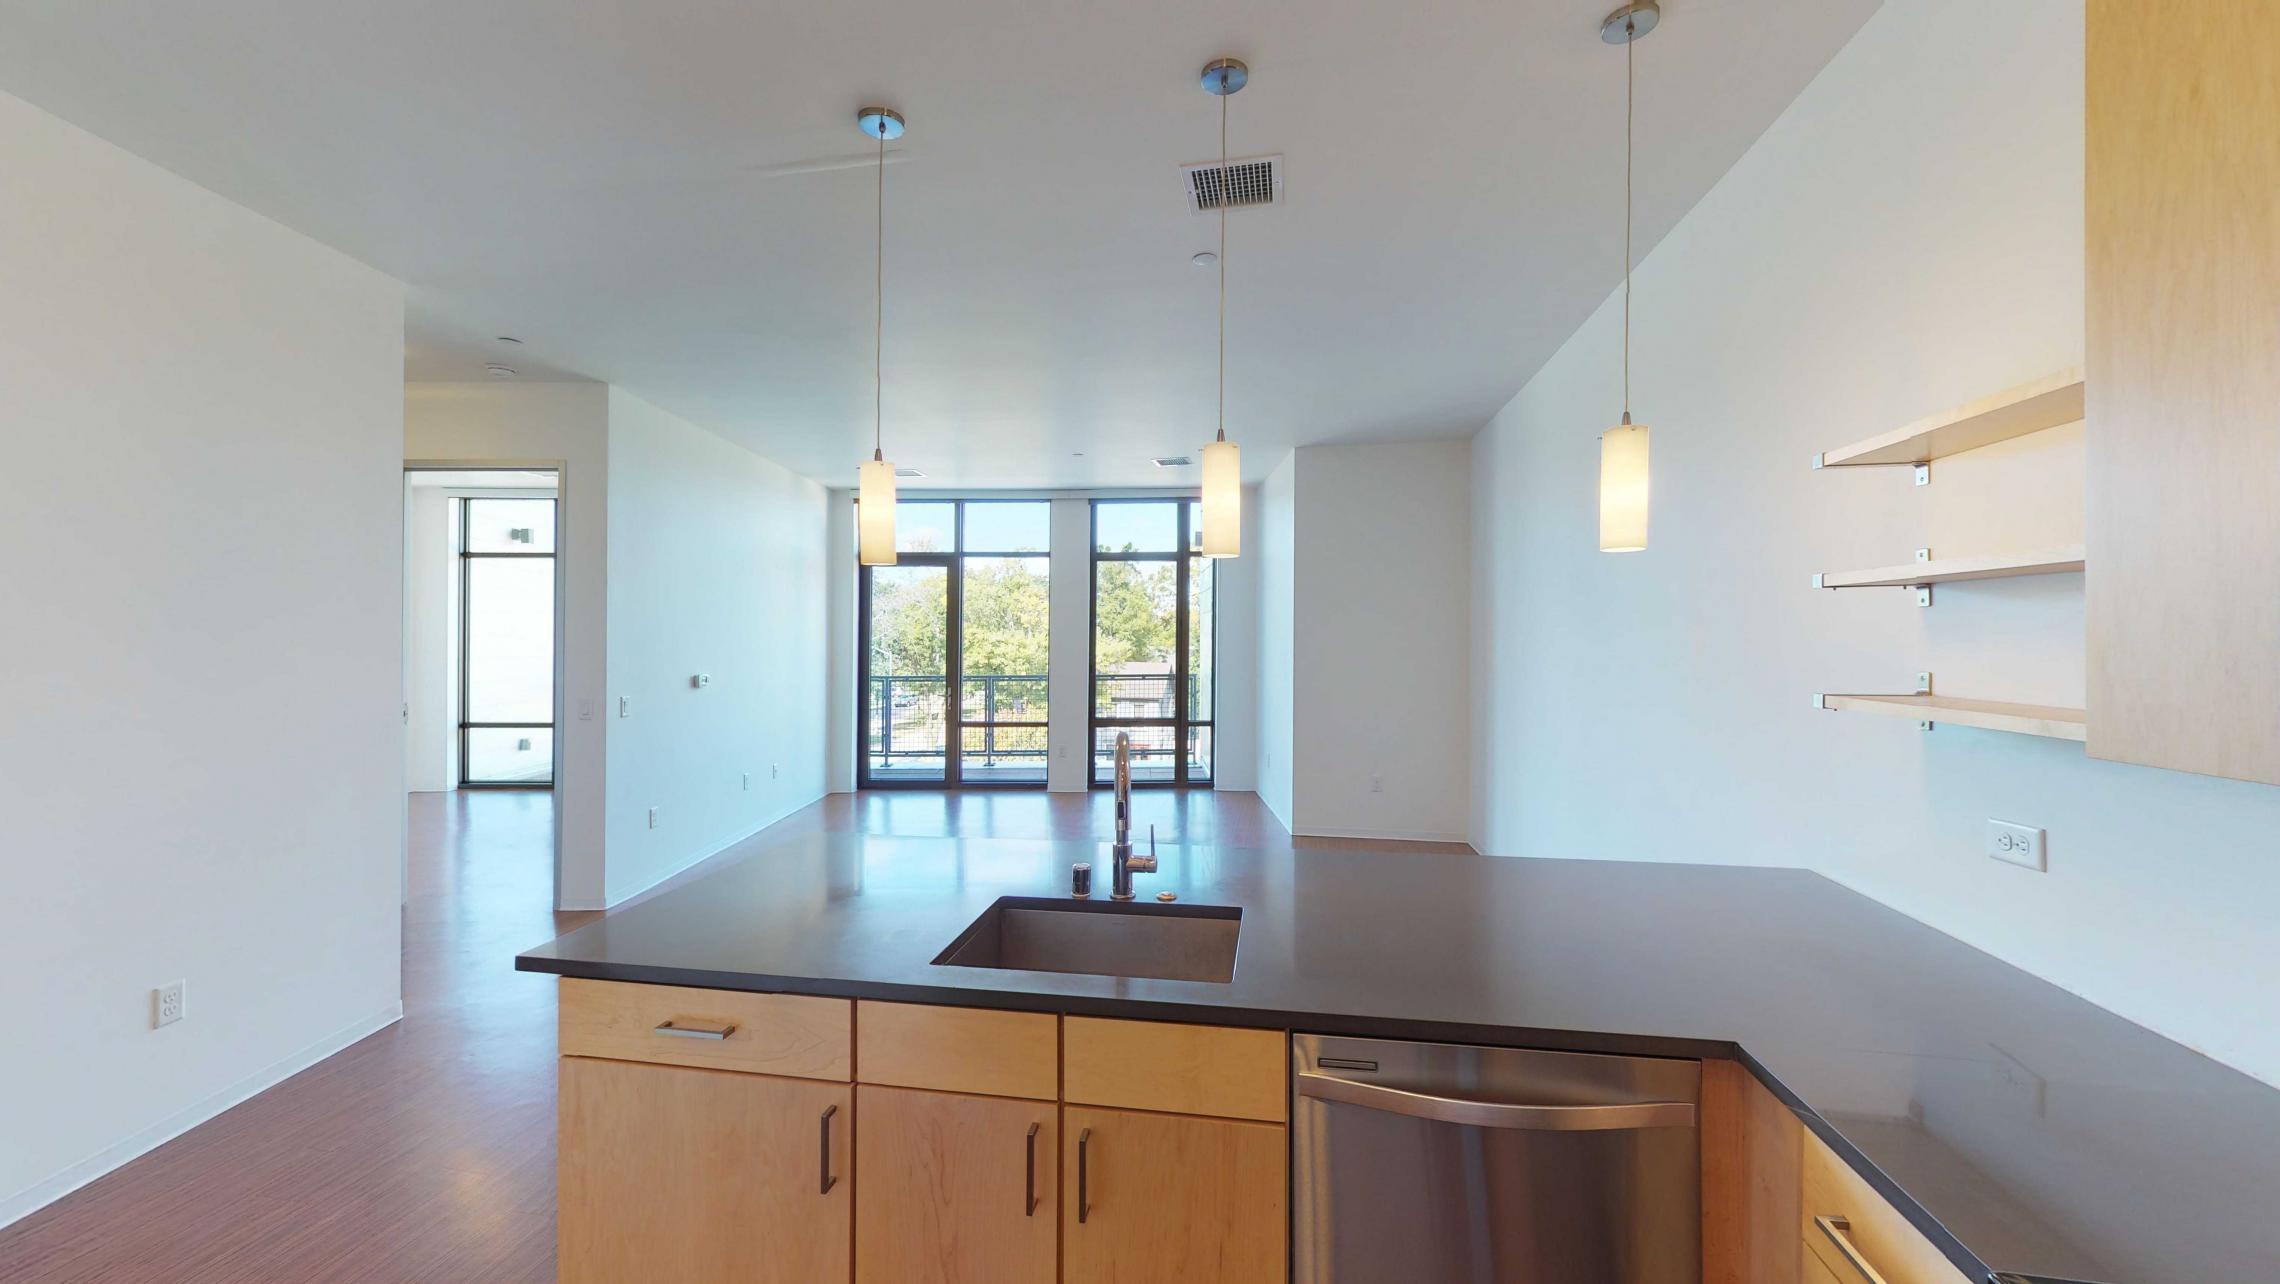 SEVEN27-Apartment-312-Modern-Upscale-Views-City-Downtown-Madison-Lake-Terrace-Kicthen-Island-Luxury.jpg